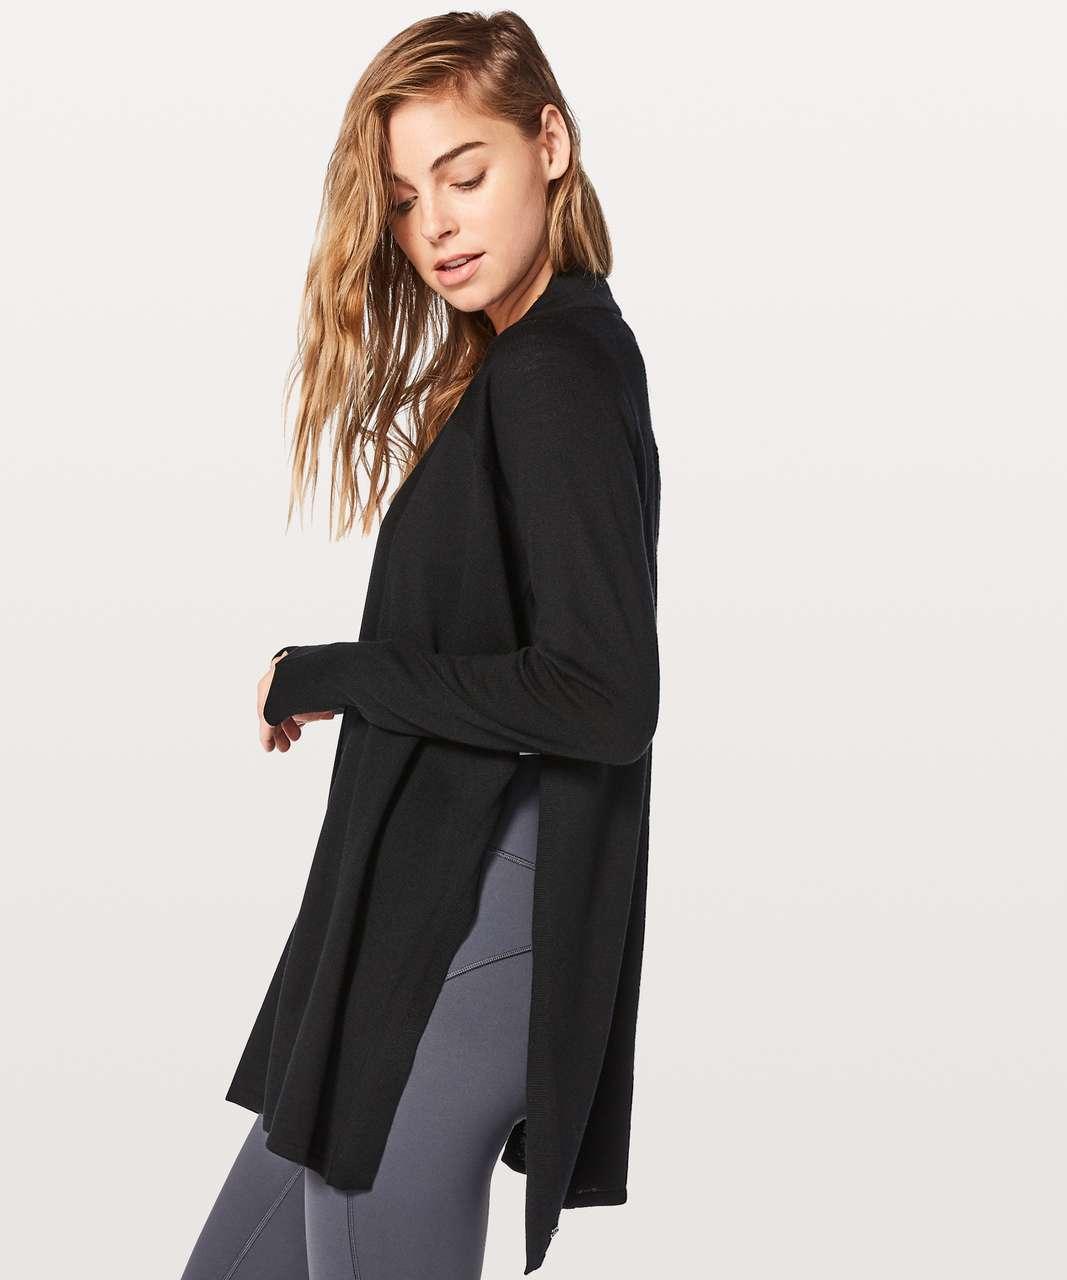 Lululemon Blissful Zen Sweater - Black